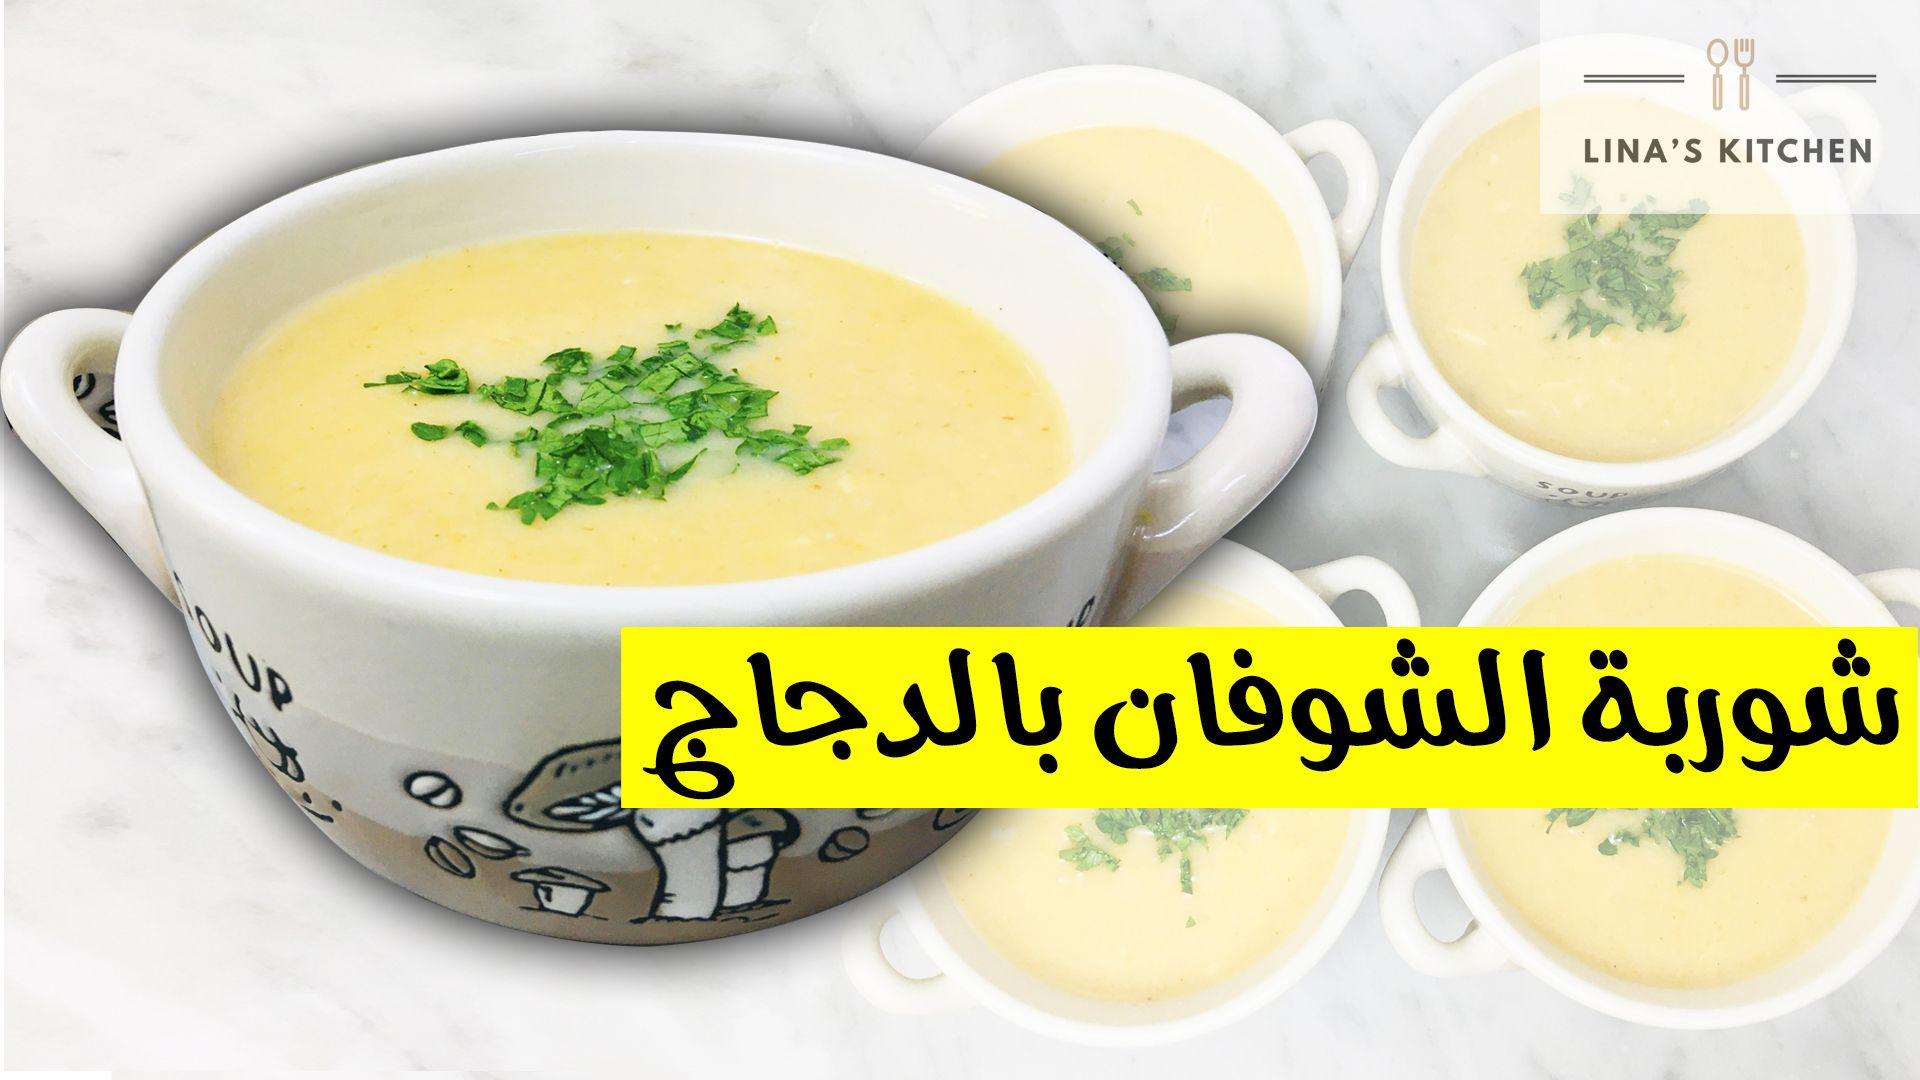 وصفة شوربة الشوفان مكتوبة بالتفصيل Cooking Recipes Recipes Cooking